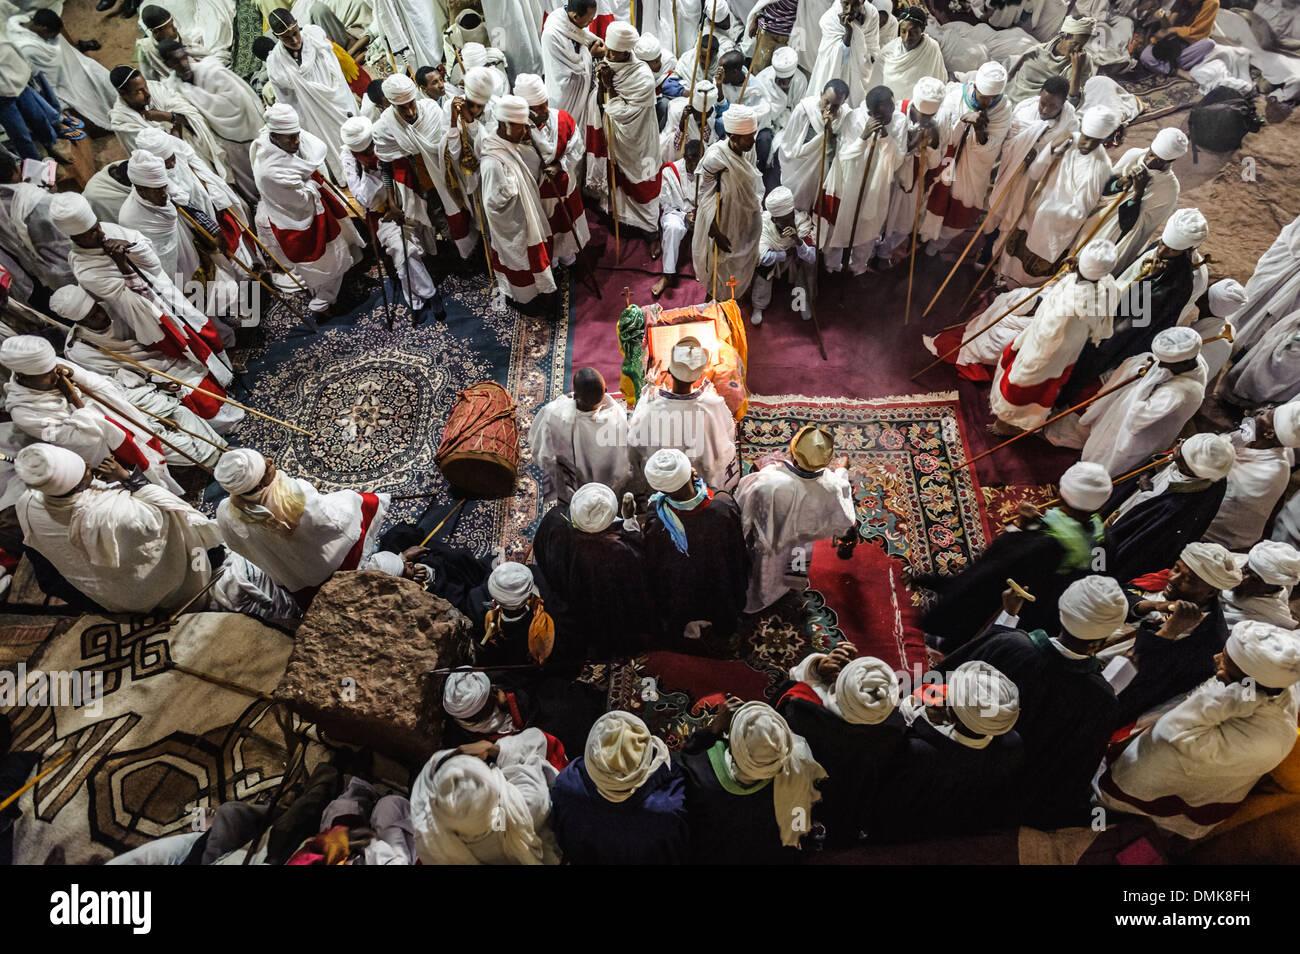 Priest celebrating Orthodox Easter inside a temple, Lalibela, Ethiopia, Africa - Stock Image